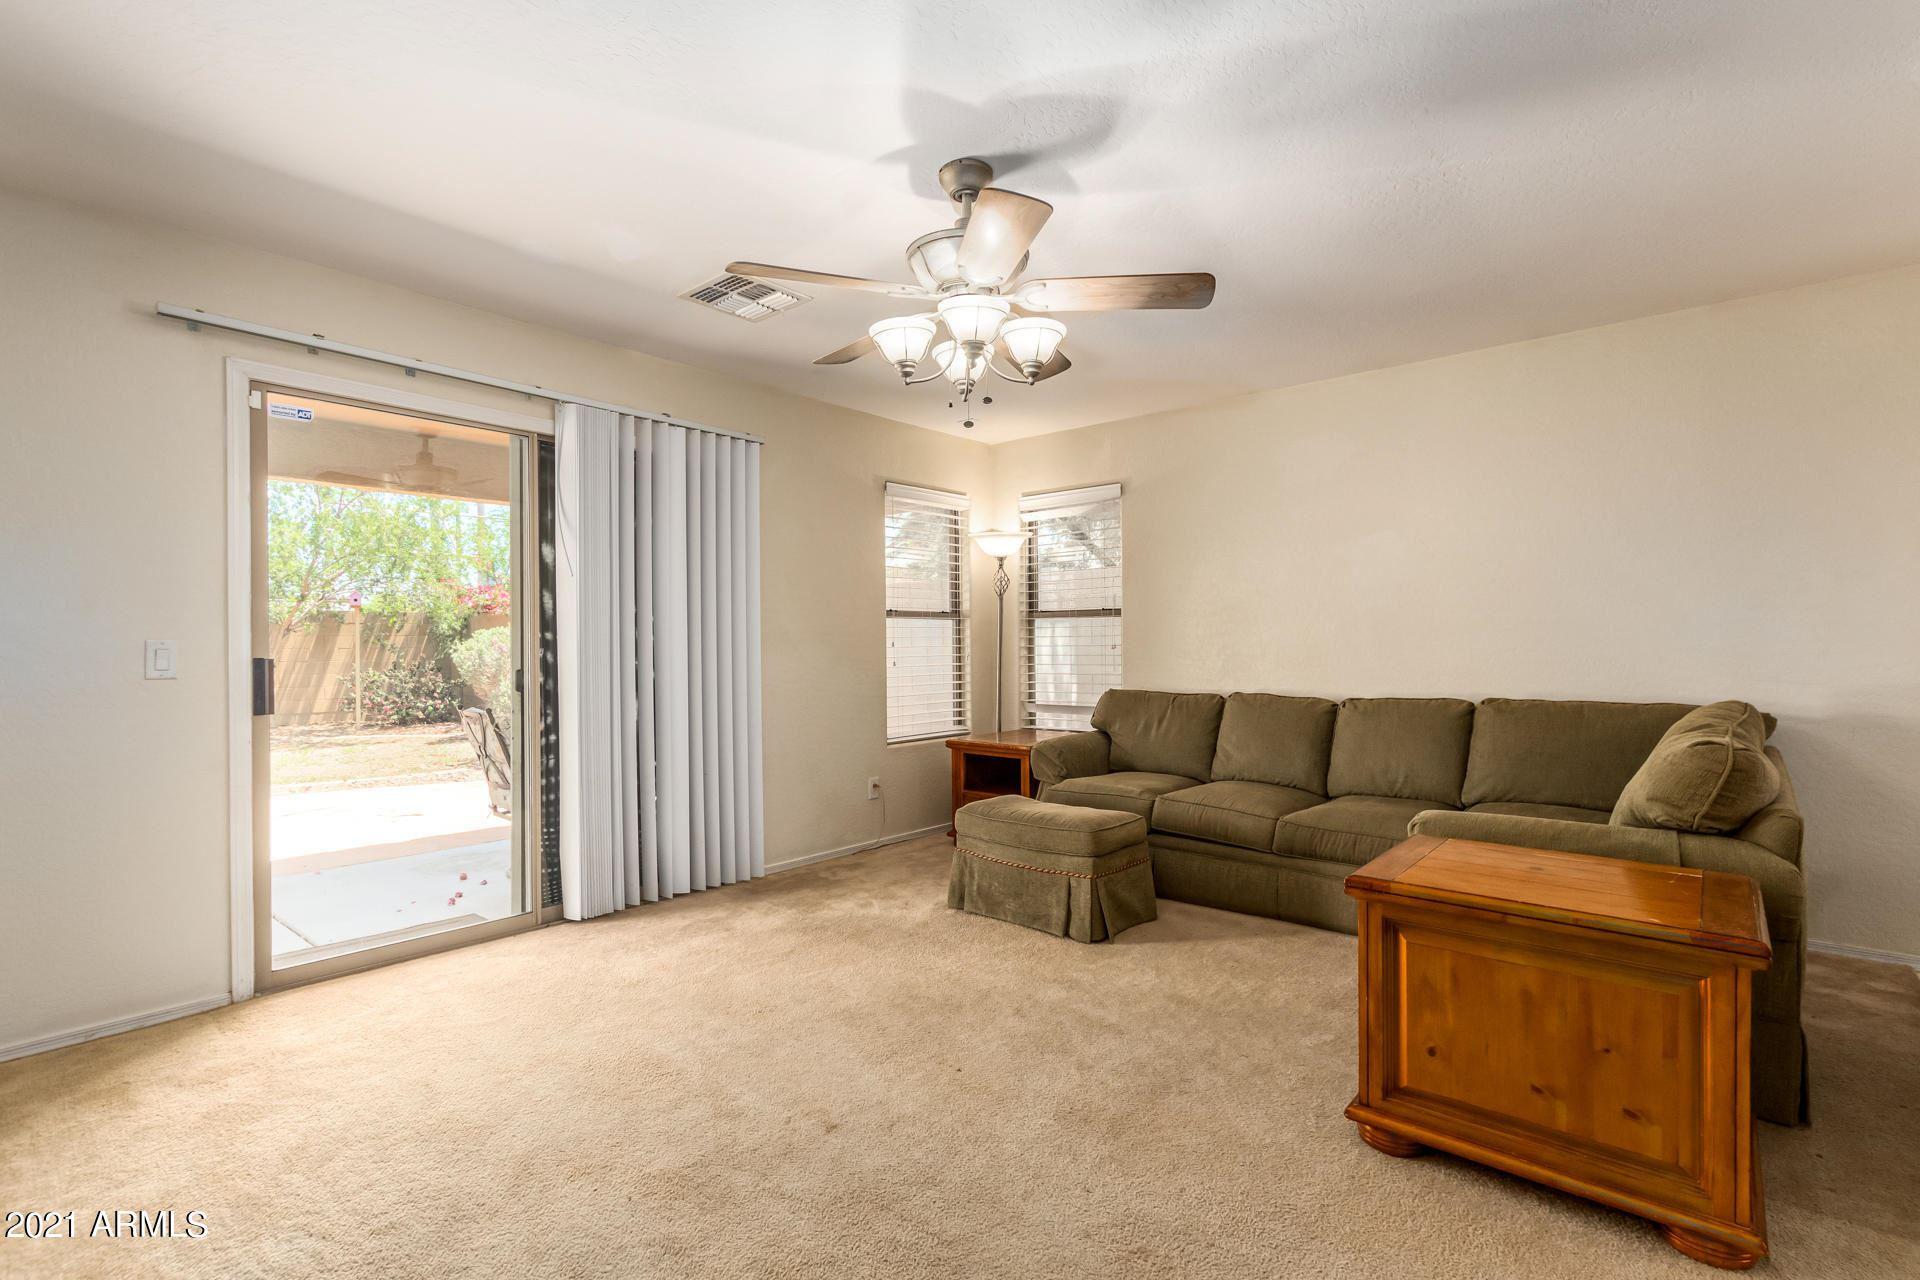 Photo of 1305 S 117TH Drive, Avondale, AZ 85323 (MLS # 6231714)